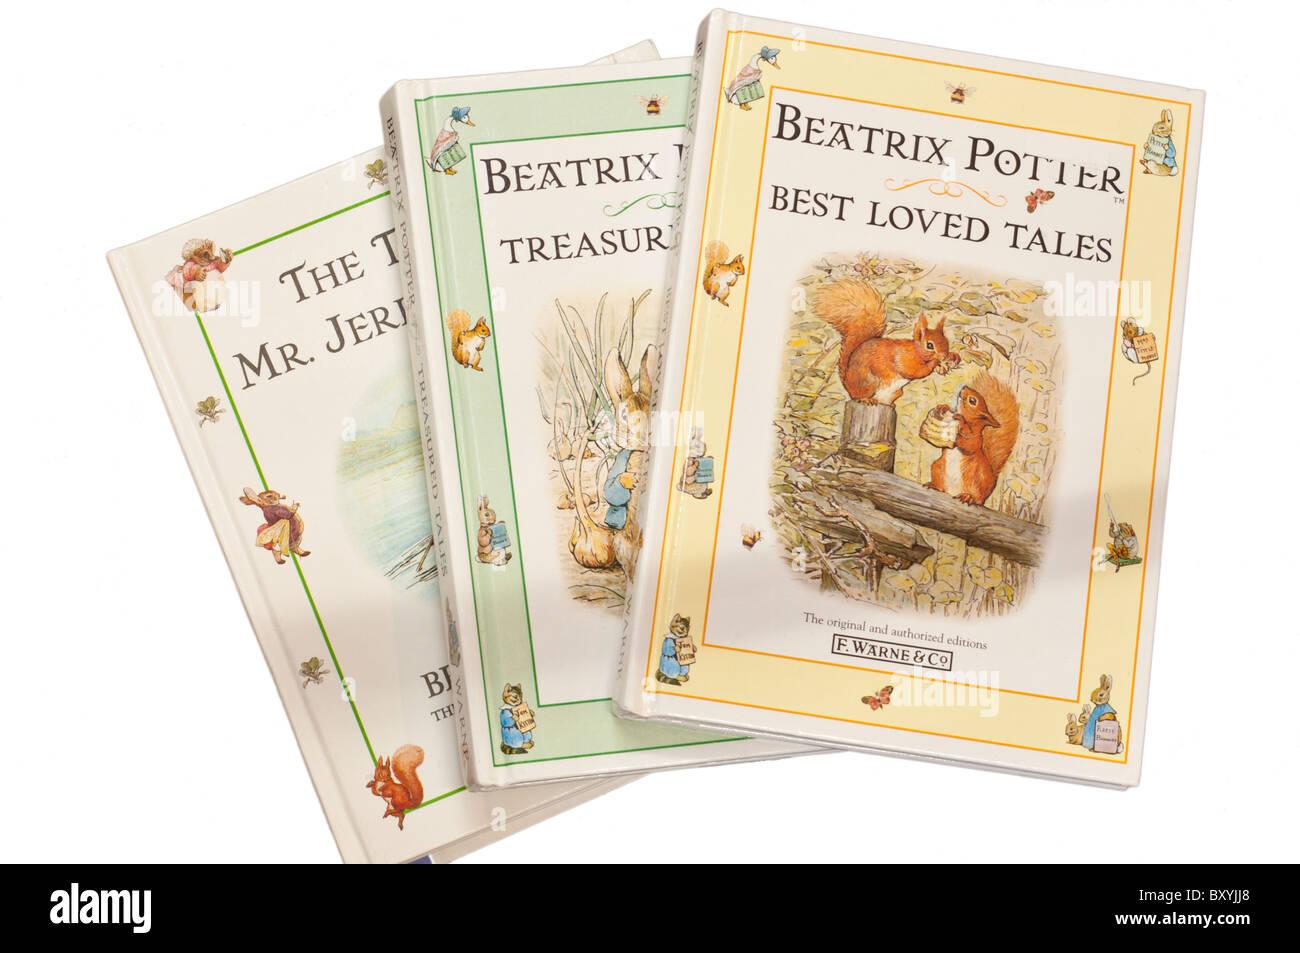 Beatrix Potter Childrens Books - Stock Image